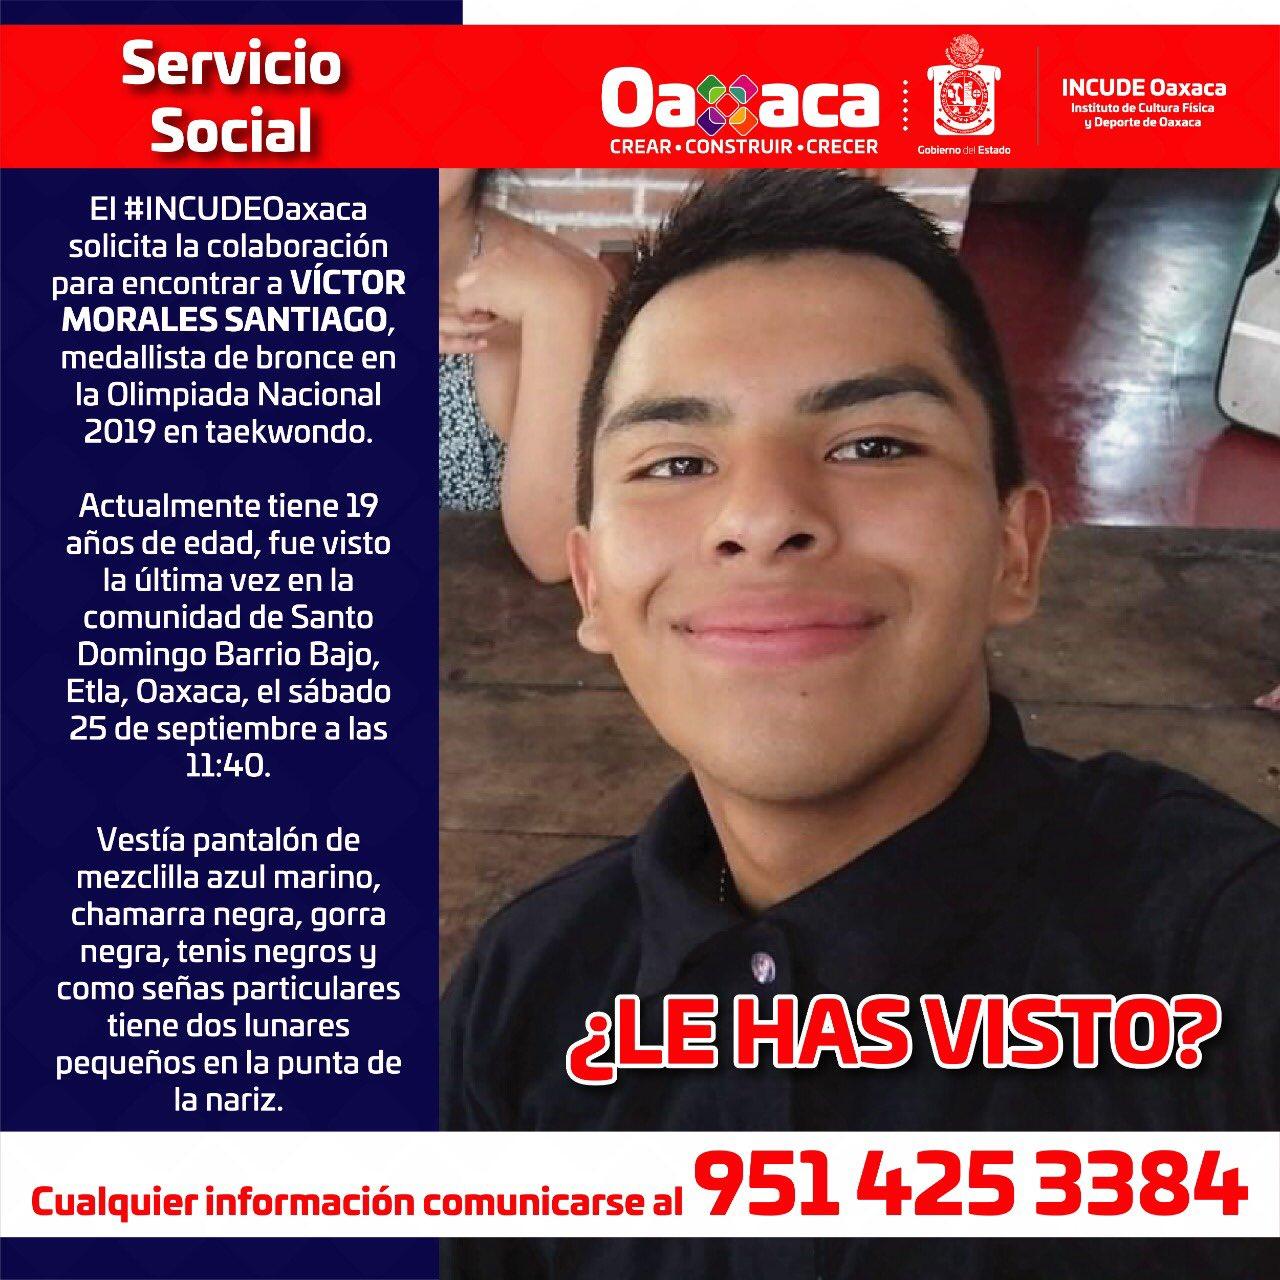 Incude Oaxaca pide ayuda para localizar a Víctor Morales, medallista de taekwondo